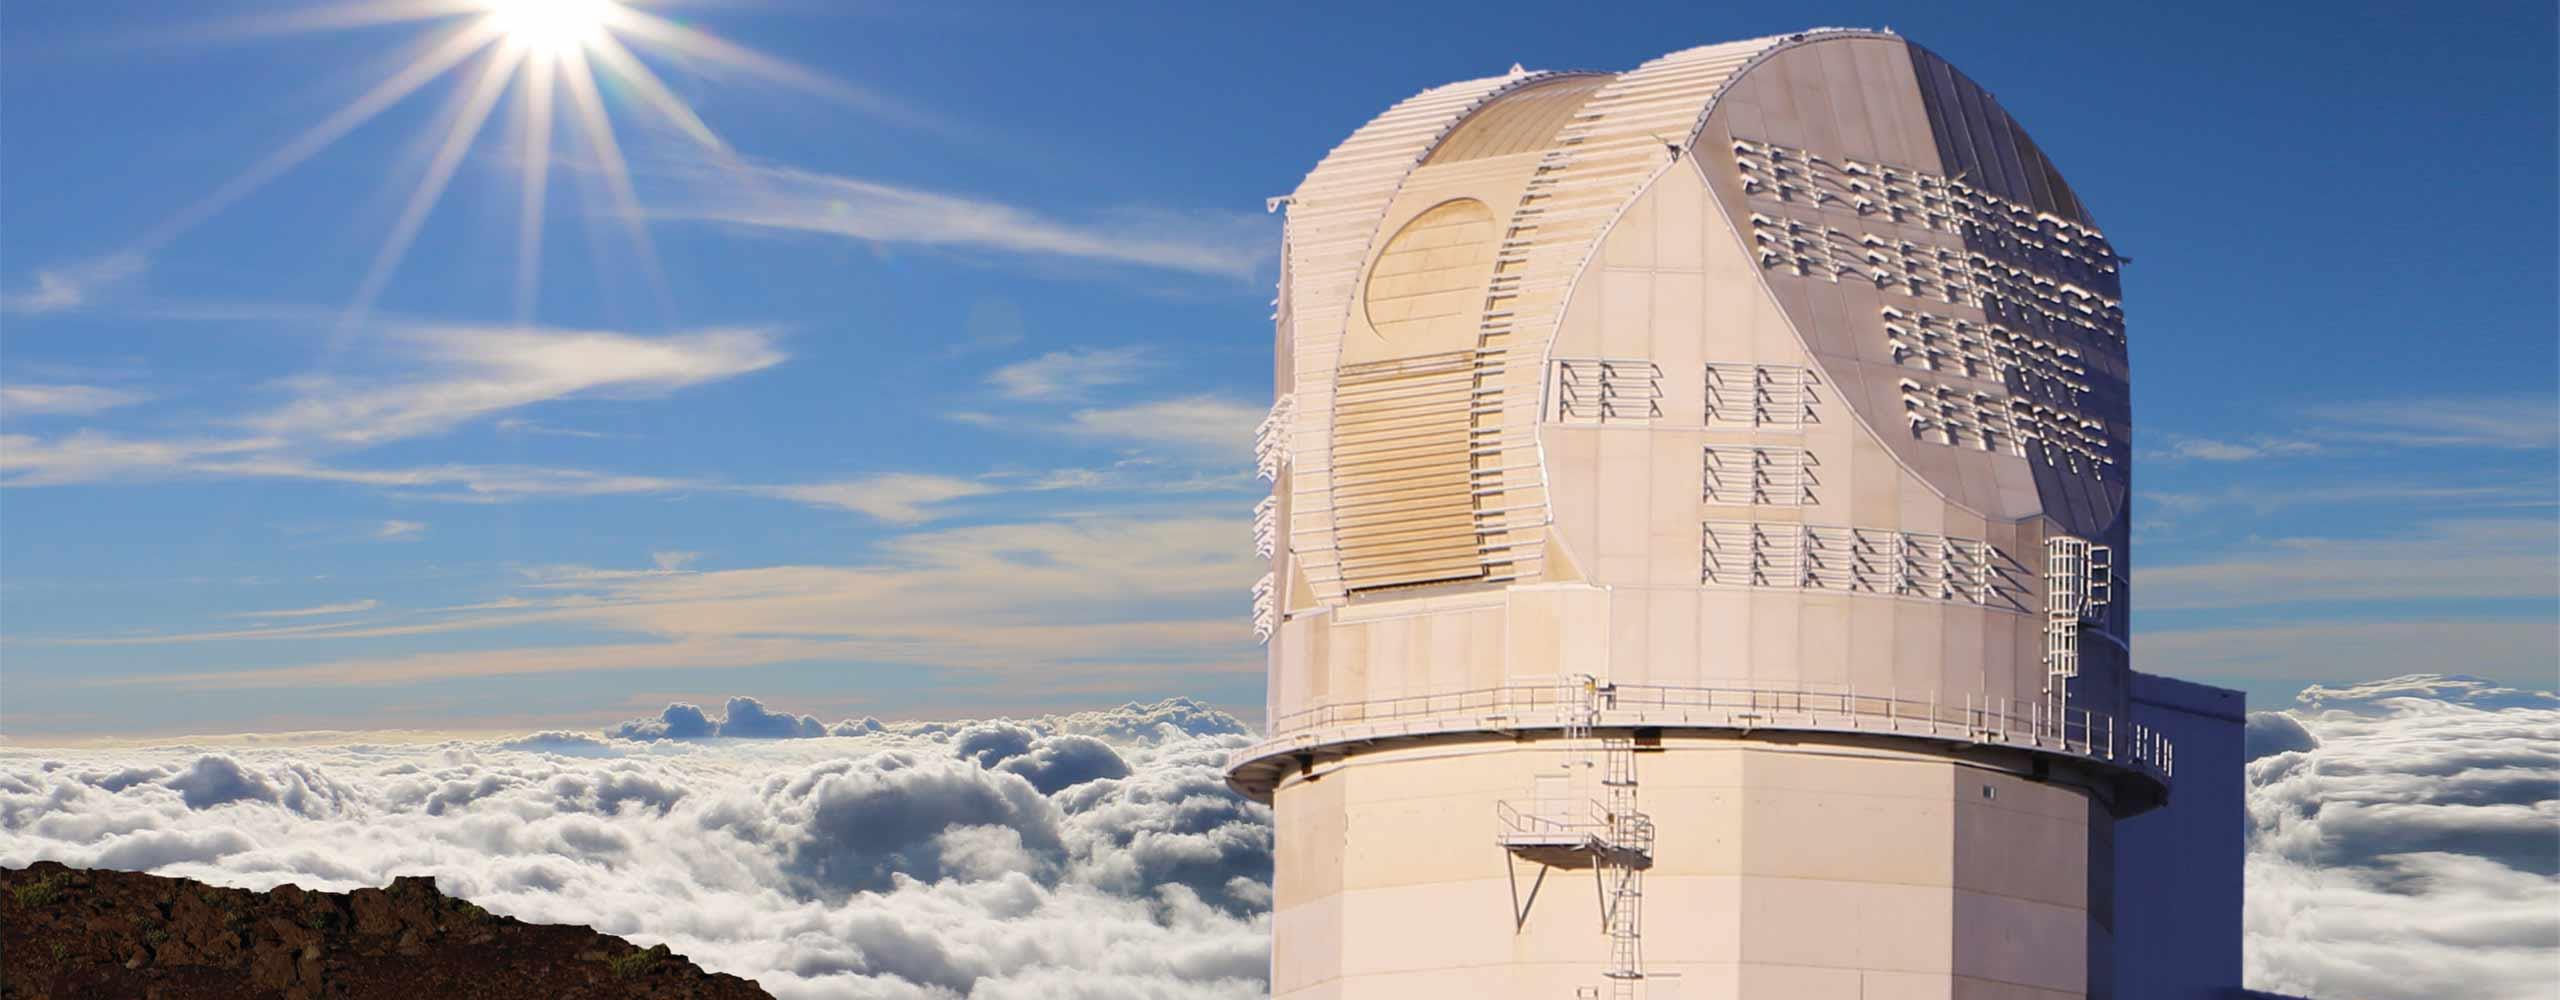 NSO - AURA Astronomy